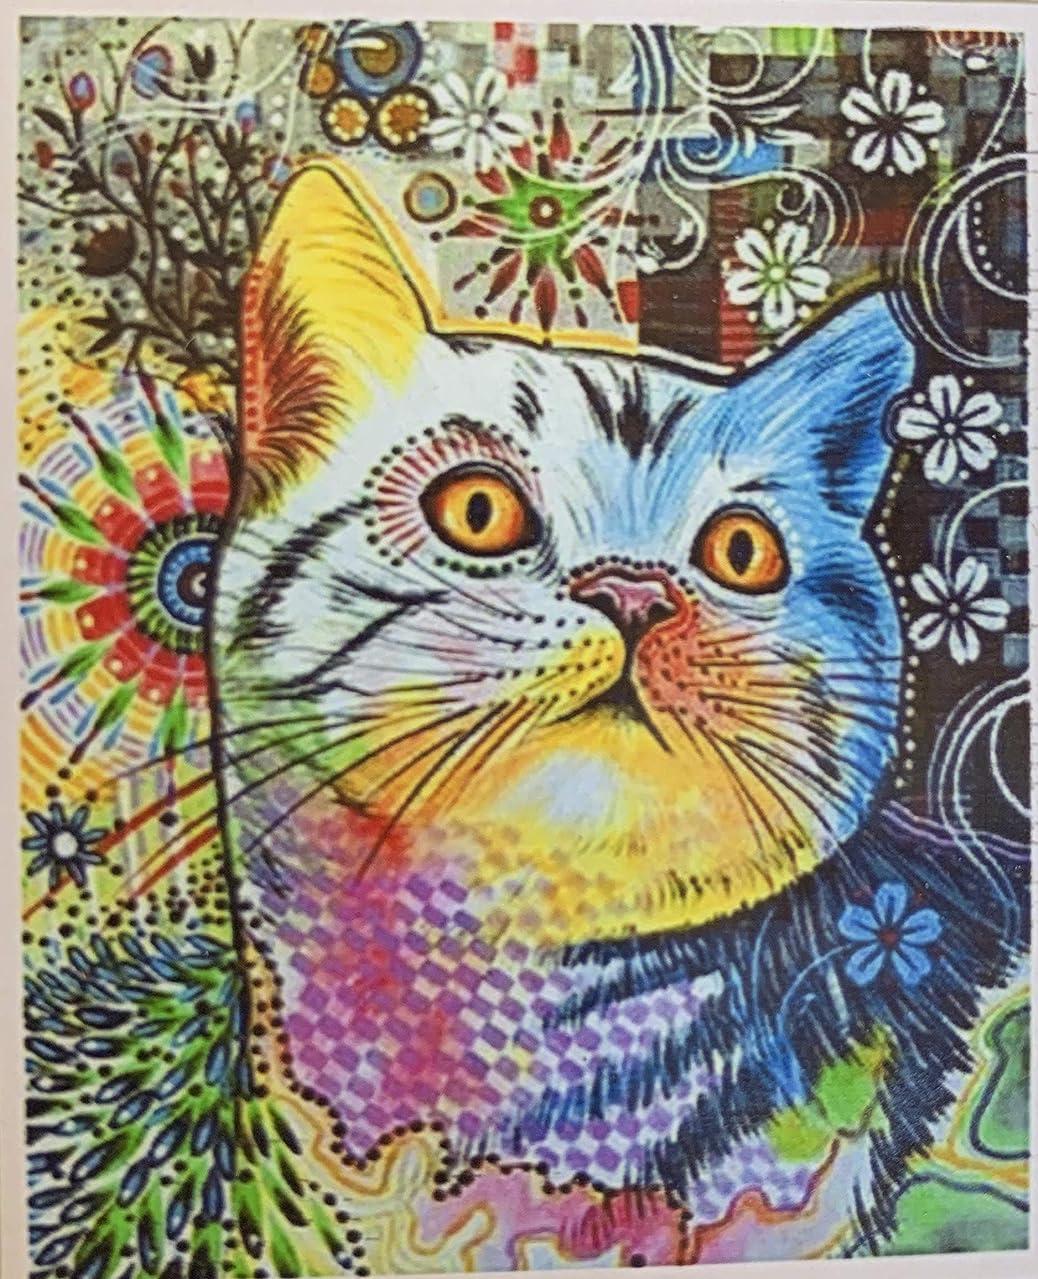 Diamond Painting Tiger Owl Cat Full Round Drill 40 x 50cm (Multi)